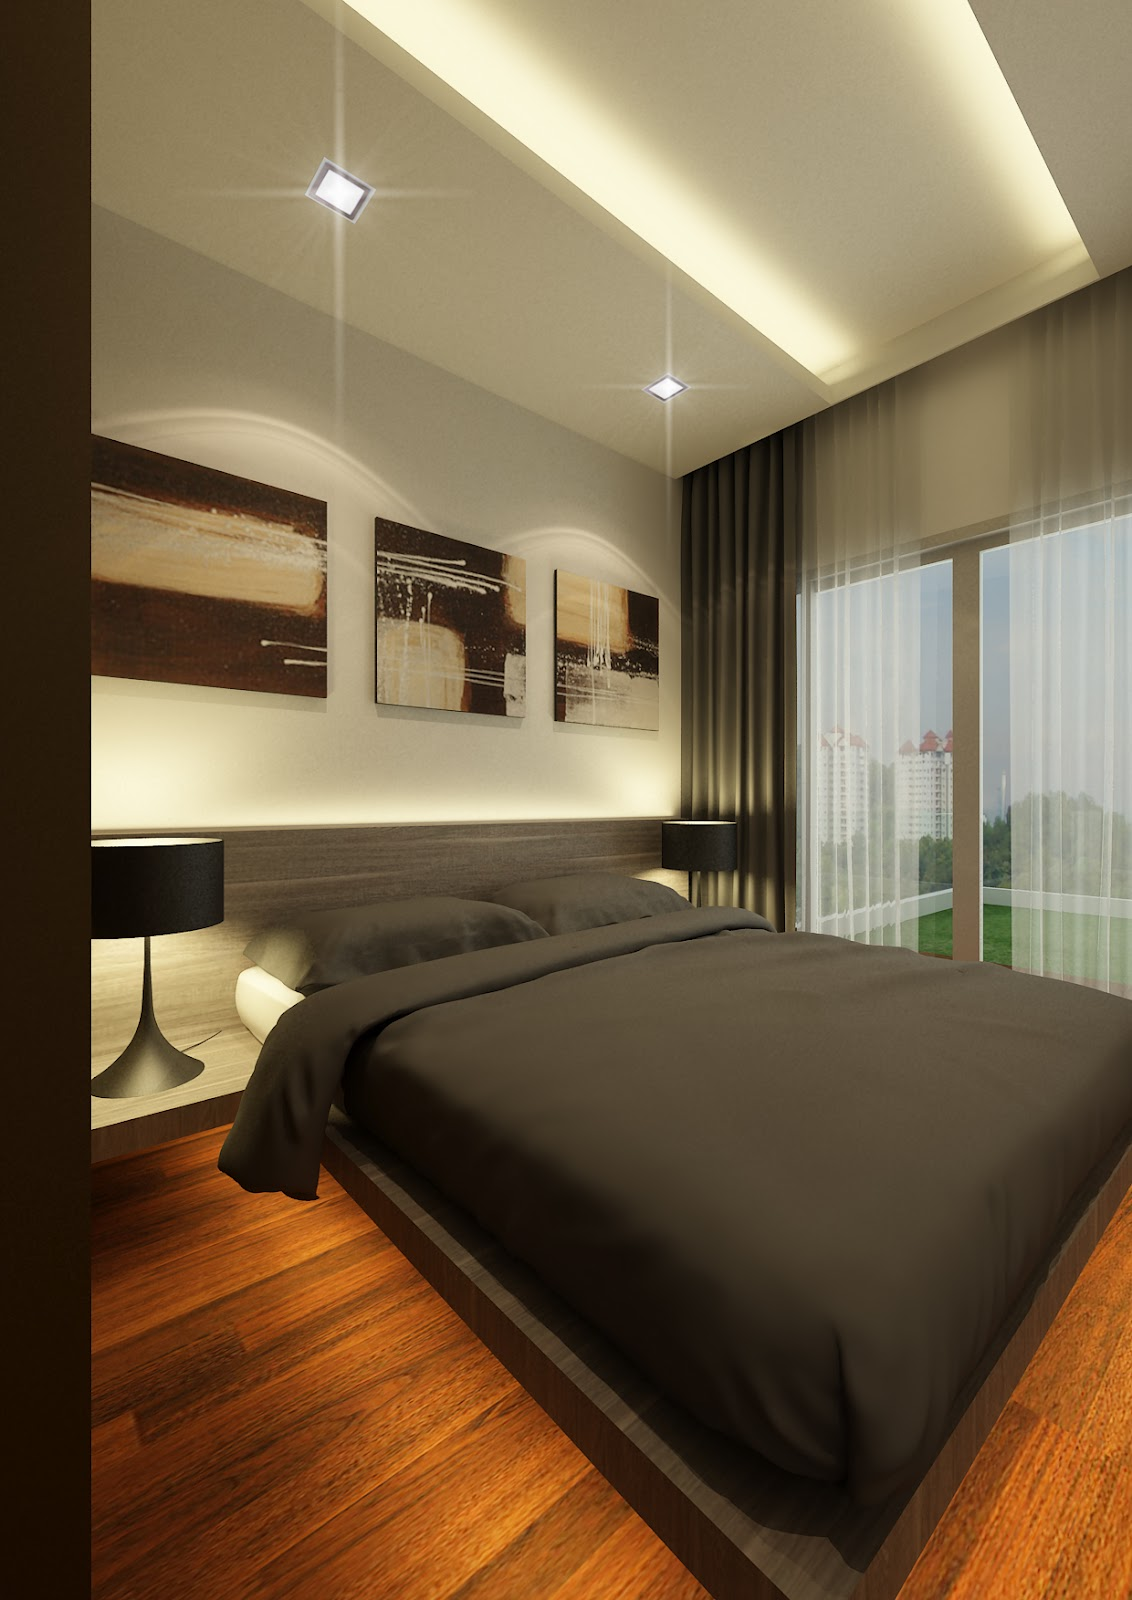 Rezt & Relax Interior Design: Double Bay Residences 3D